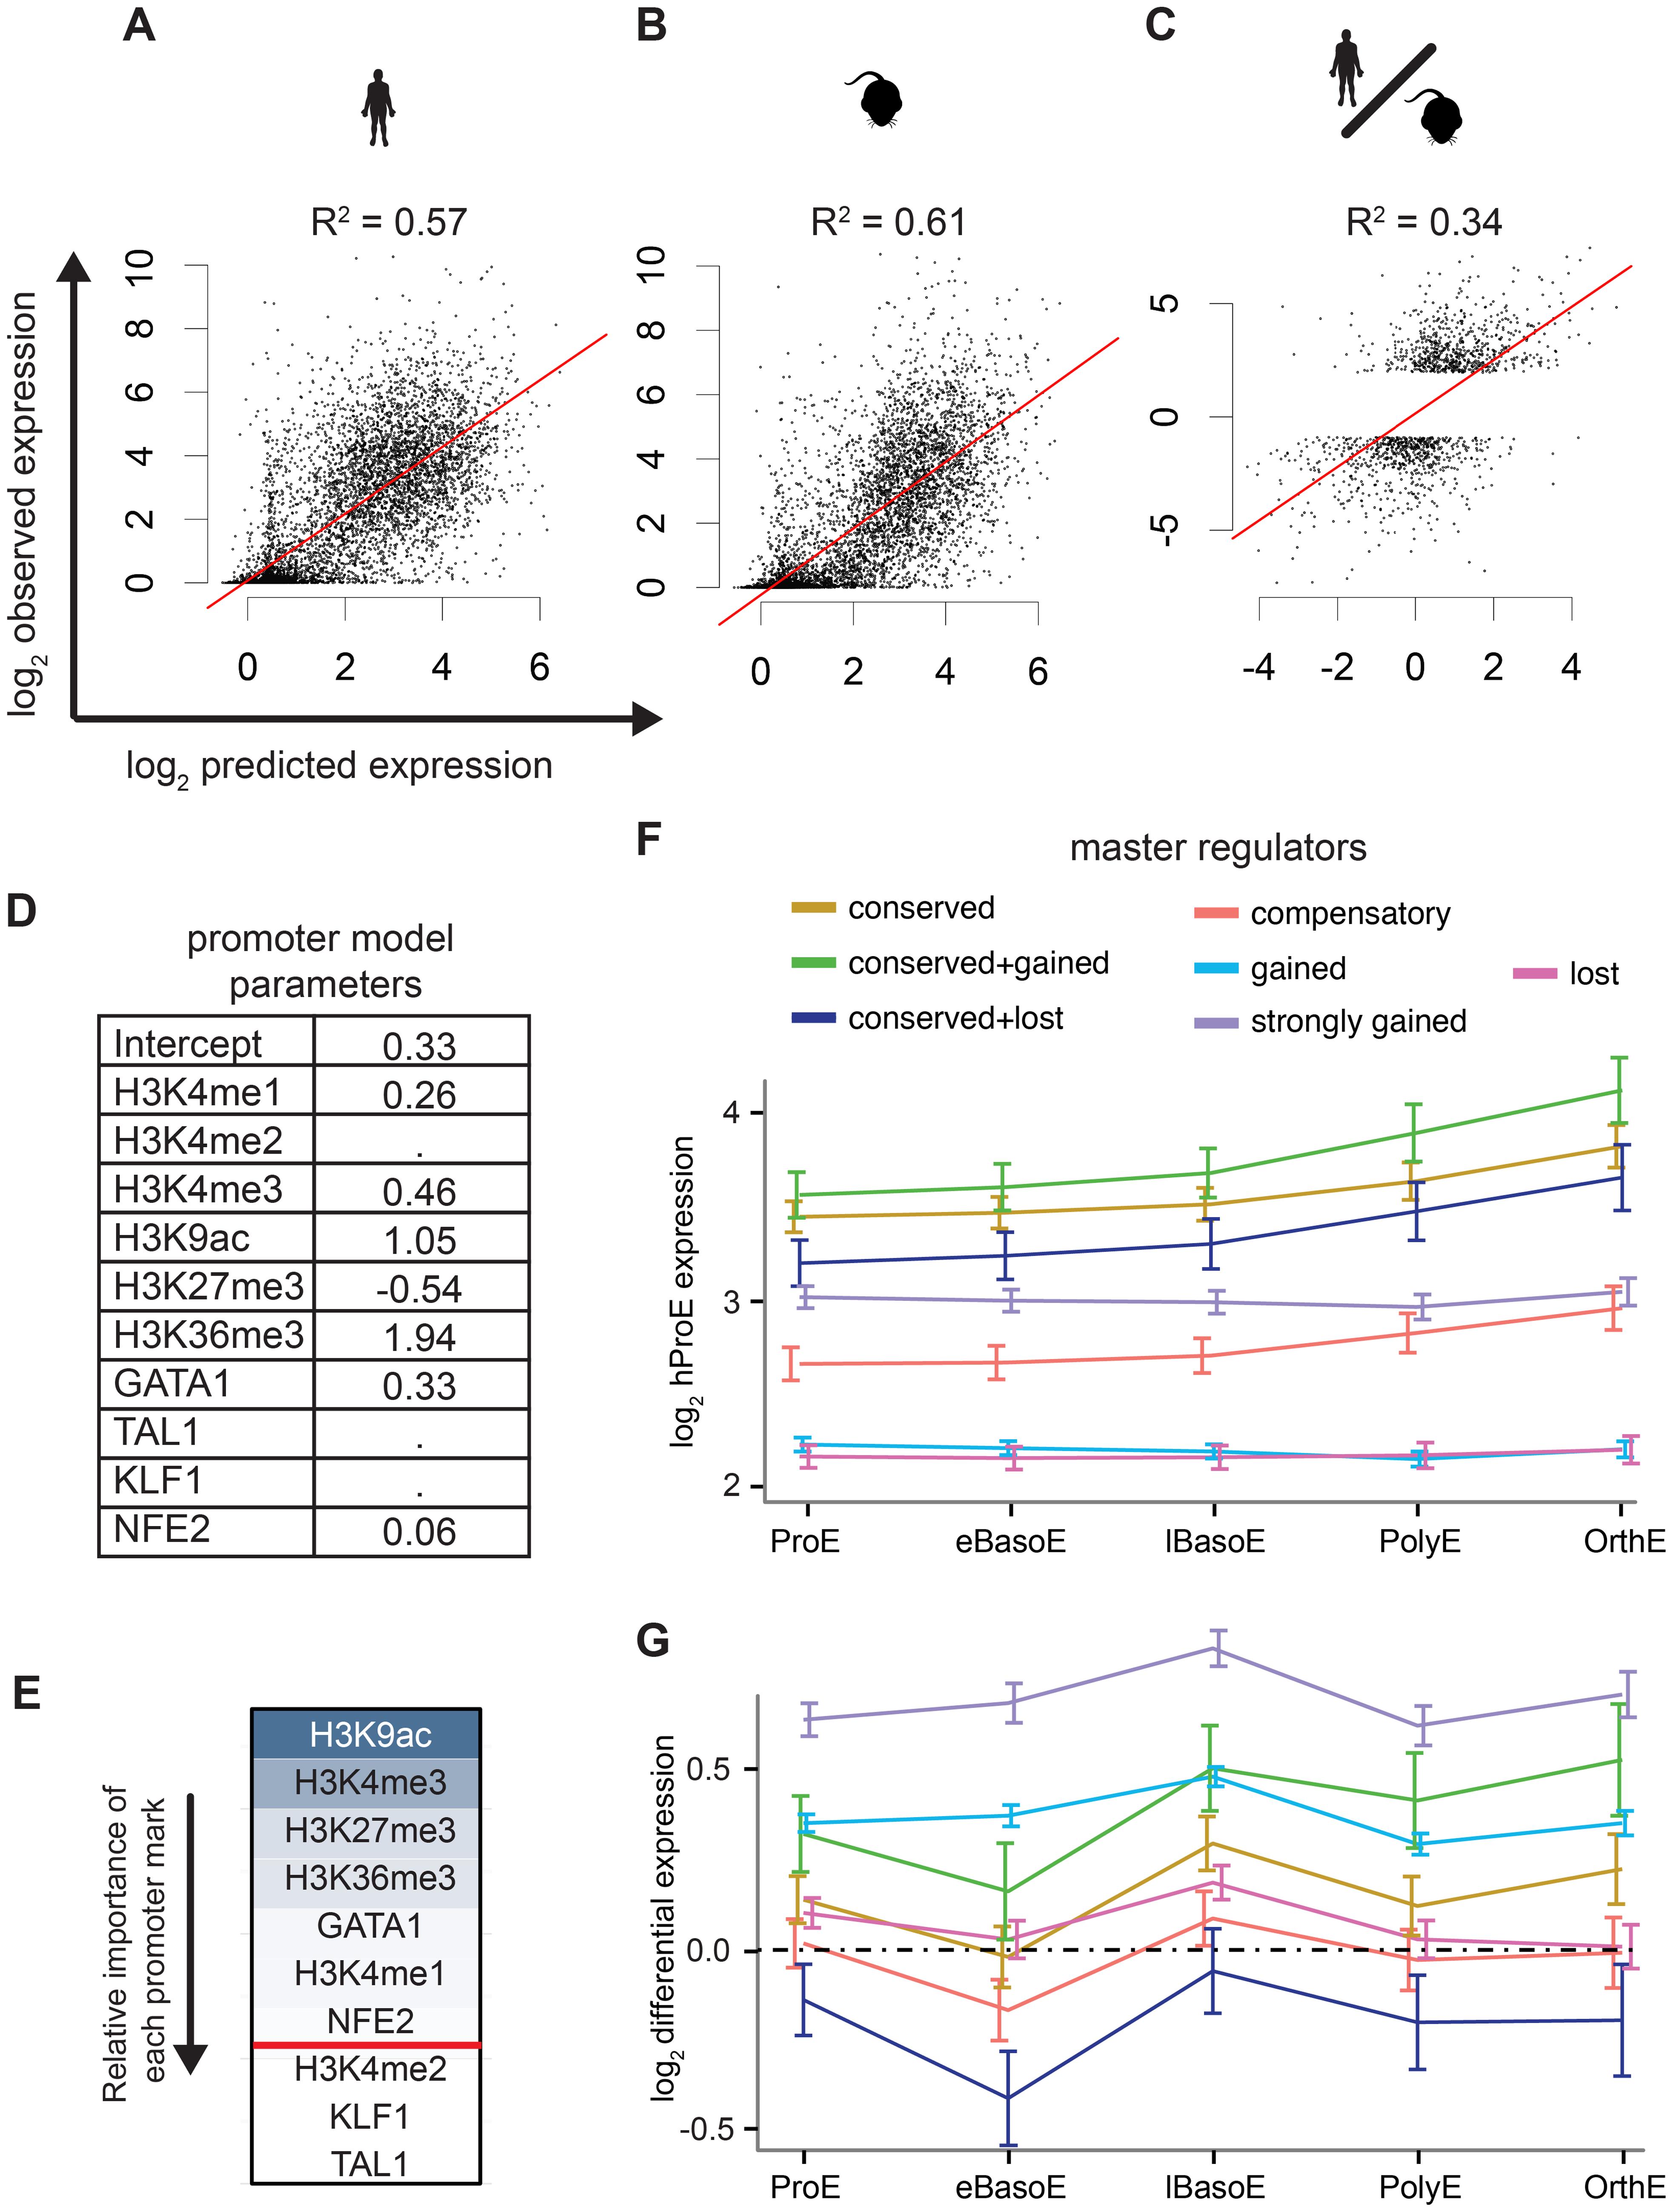 Predictive models of gene expression across species.